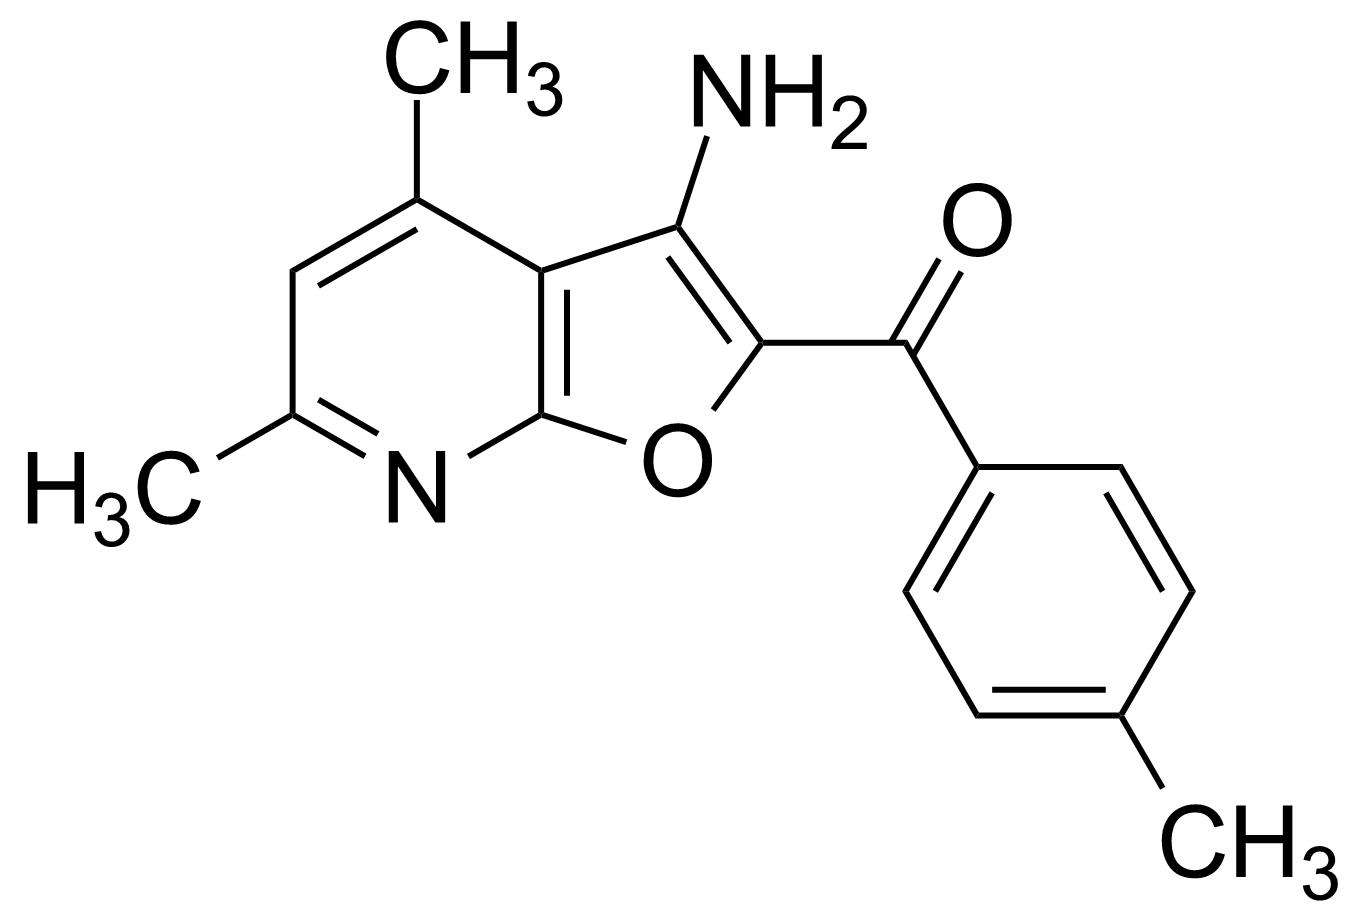 Structure of (3-Amino-4,6-dimethyl-furo[2,3-b]pyridin-2-yl)-p-tolyl-methanone